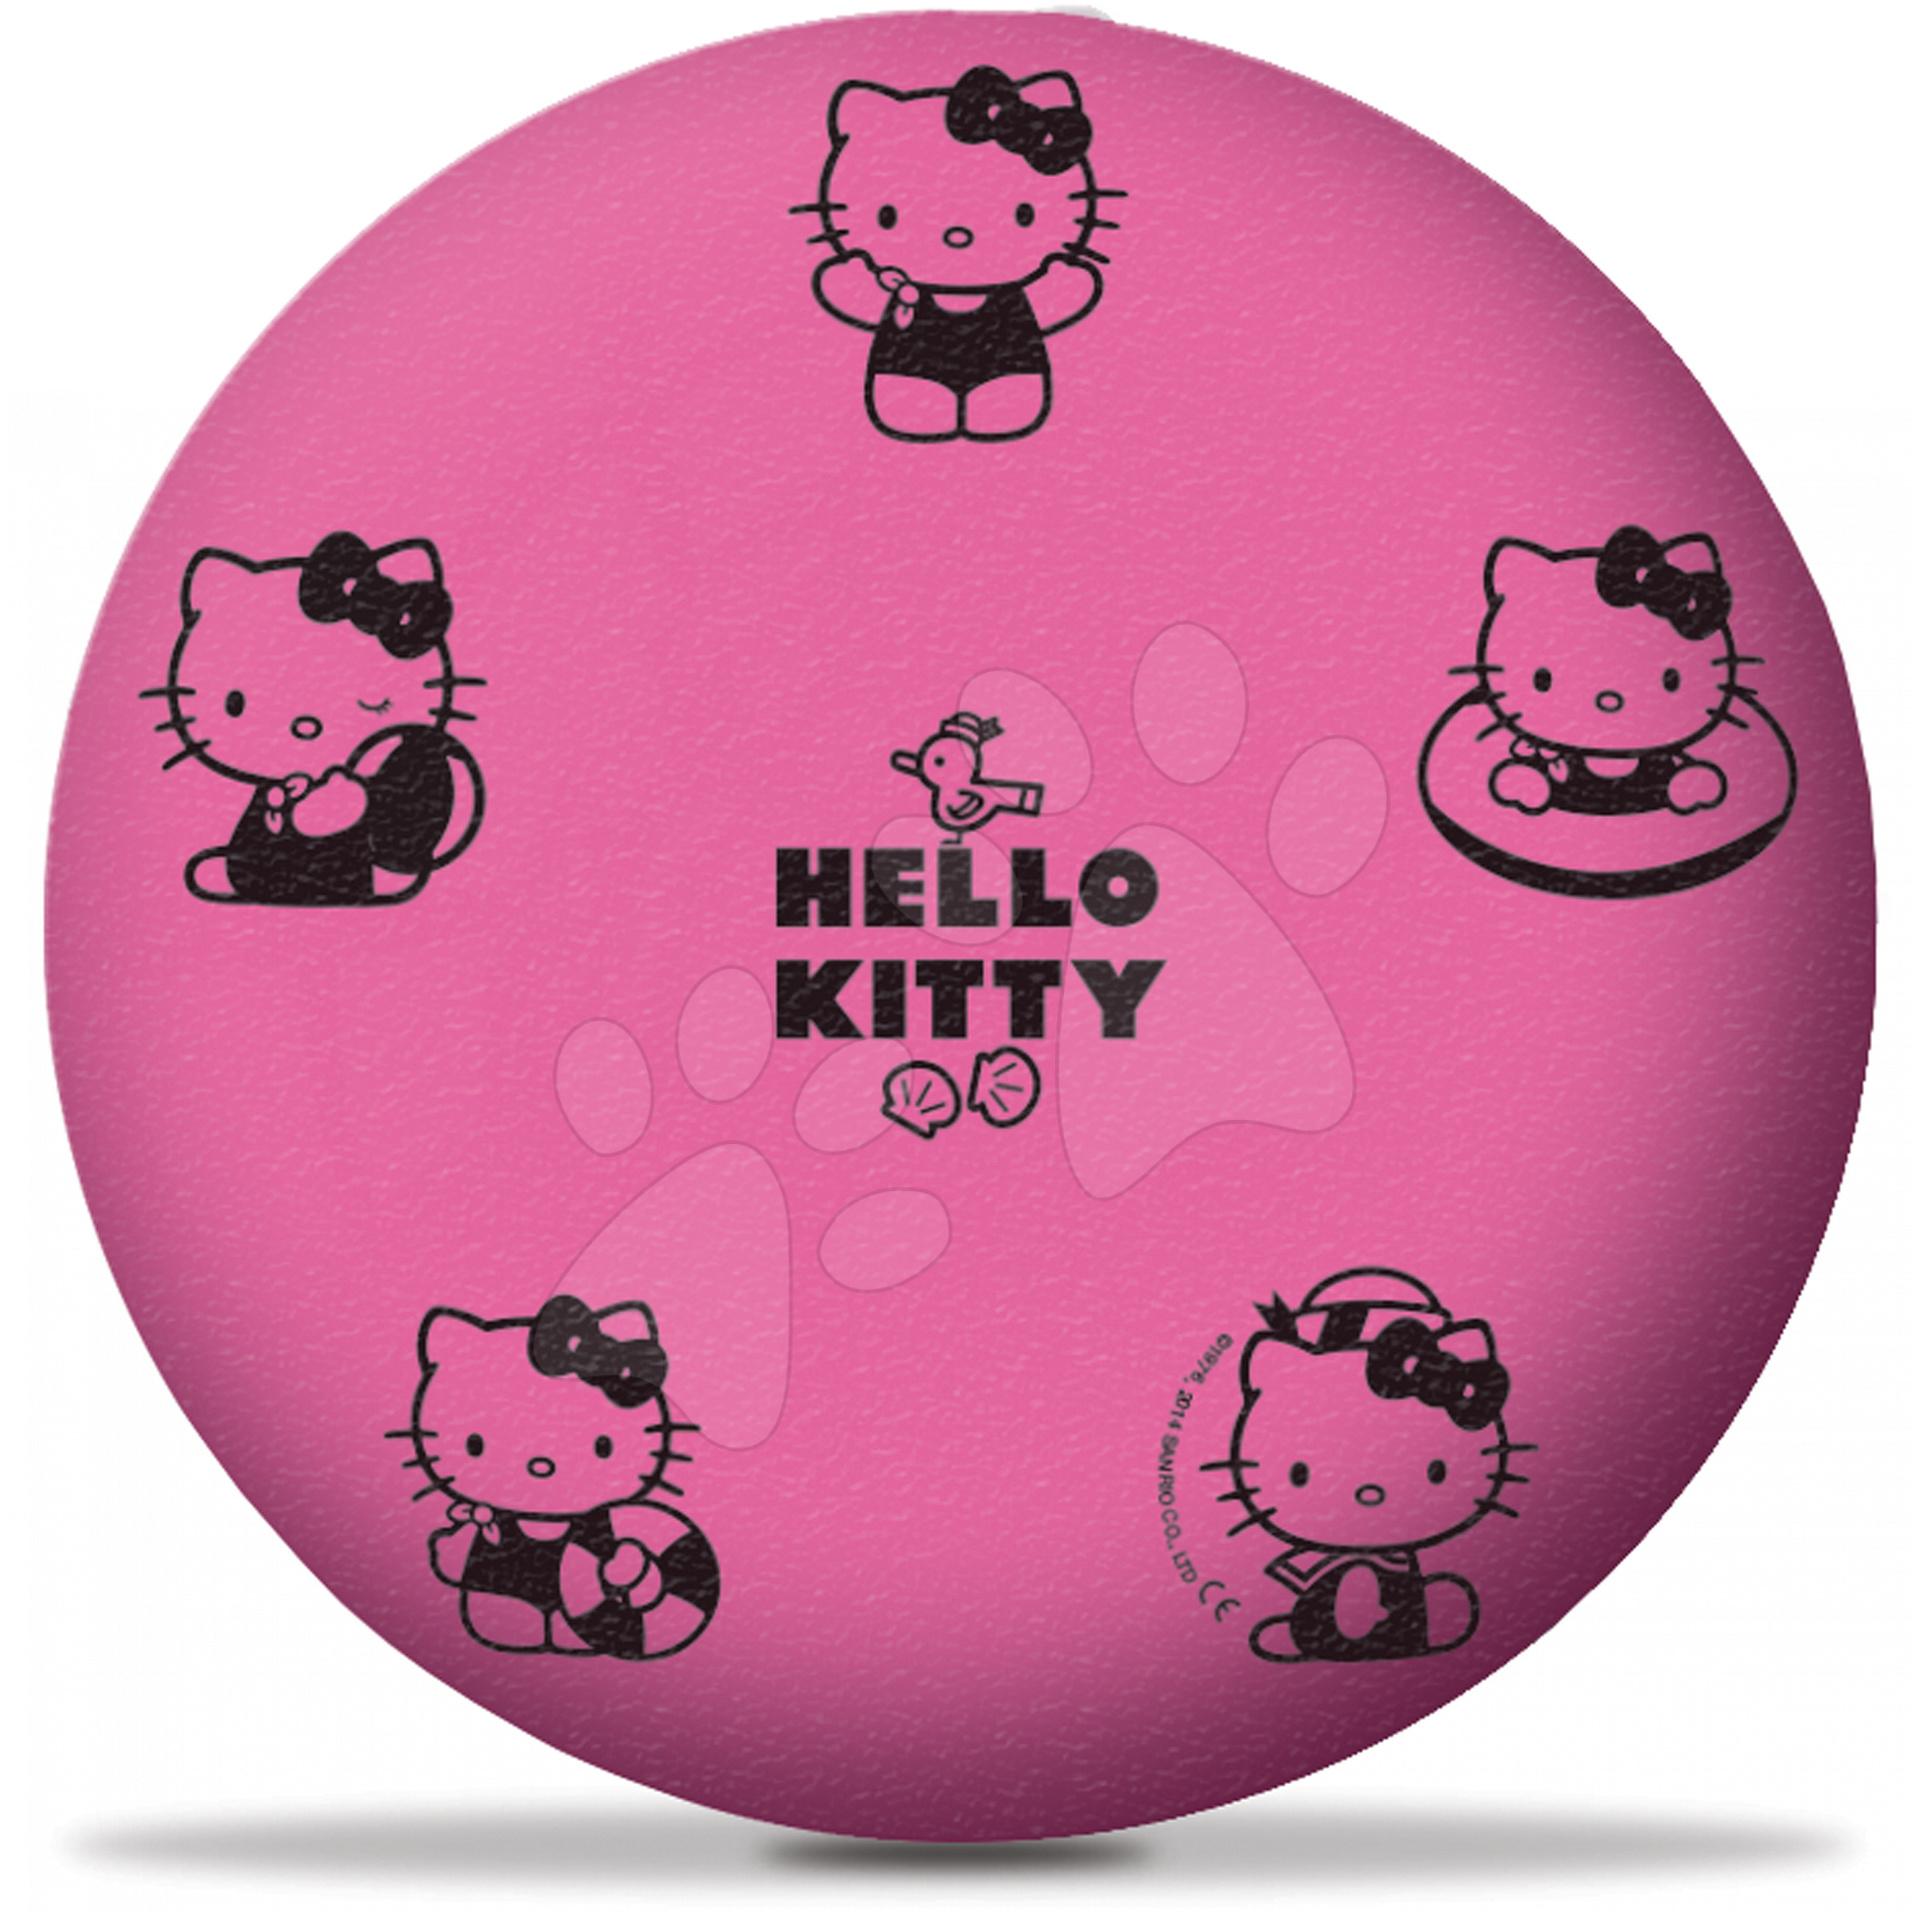 Žoga iz pene Hello Kitty Mondo 20 cm od 24 mes